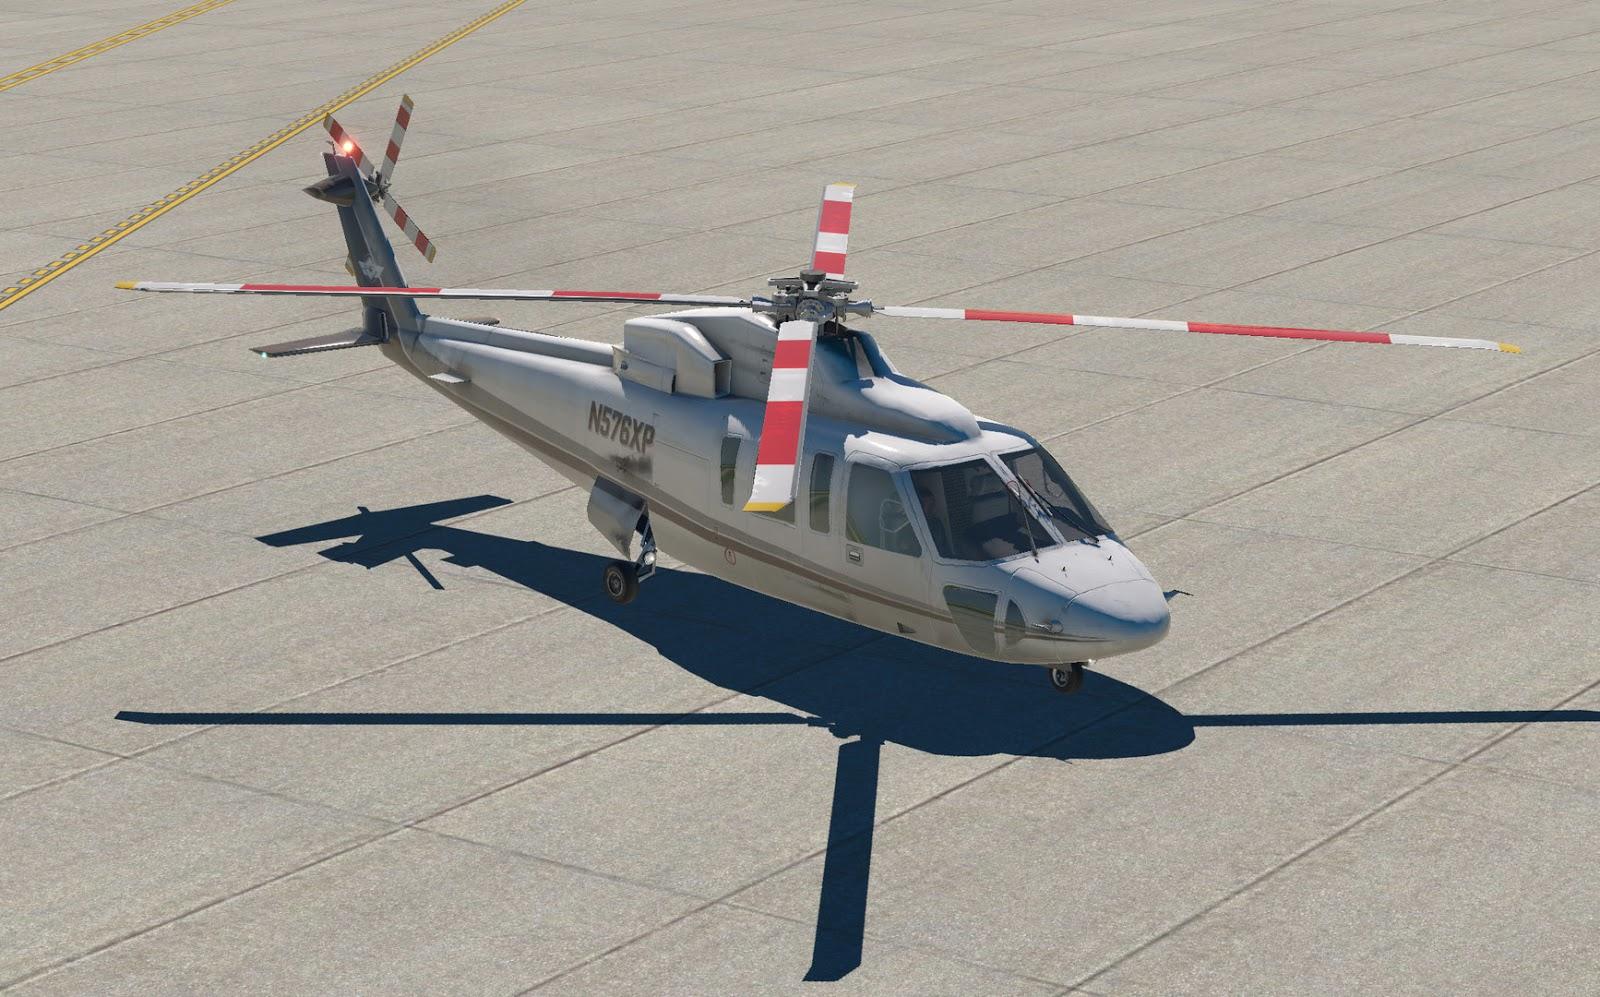 X-Plane 11 ESPAÑOL PC Full + Global Scenery DLC (CODEX) + REPACK 13 DVD5 (JPW) 7